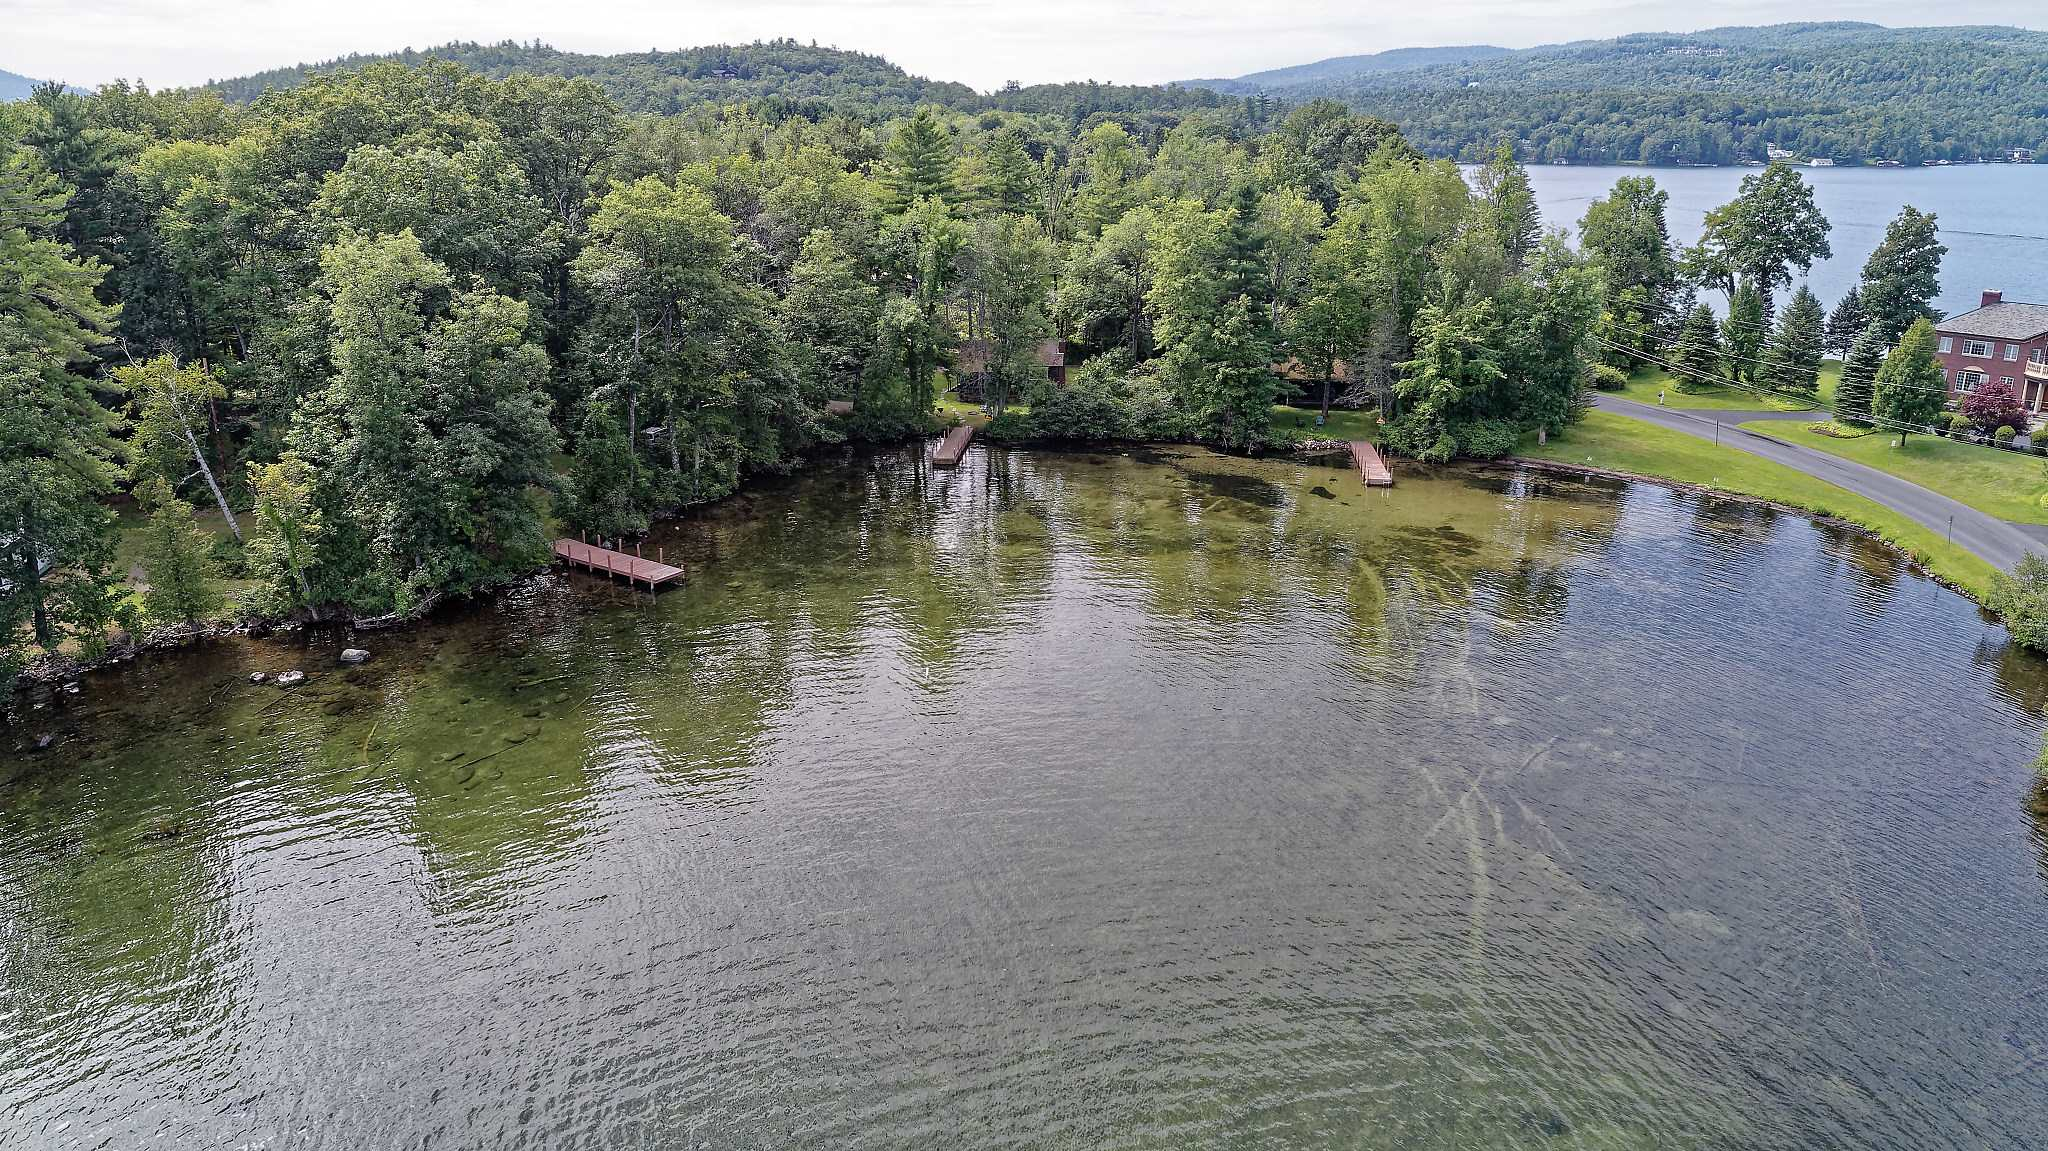 Lake George image 2